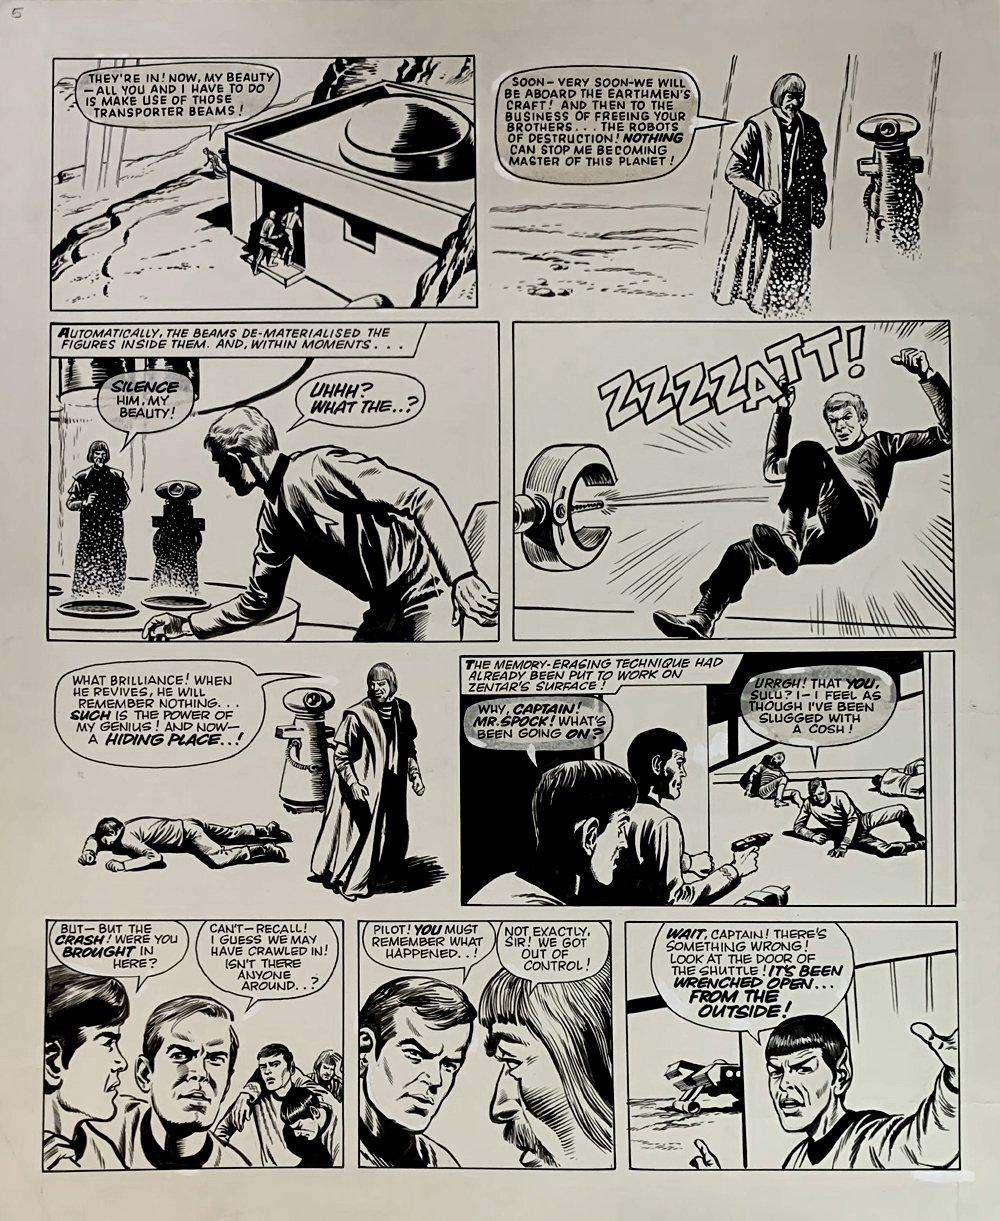 Star Trek Newspaper Strip 1-6-1972 (VERY LARGE)